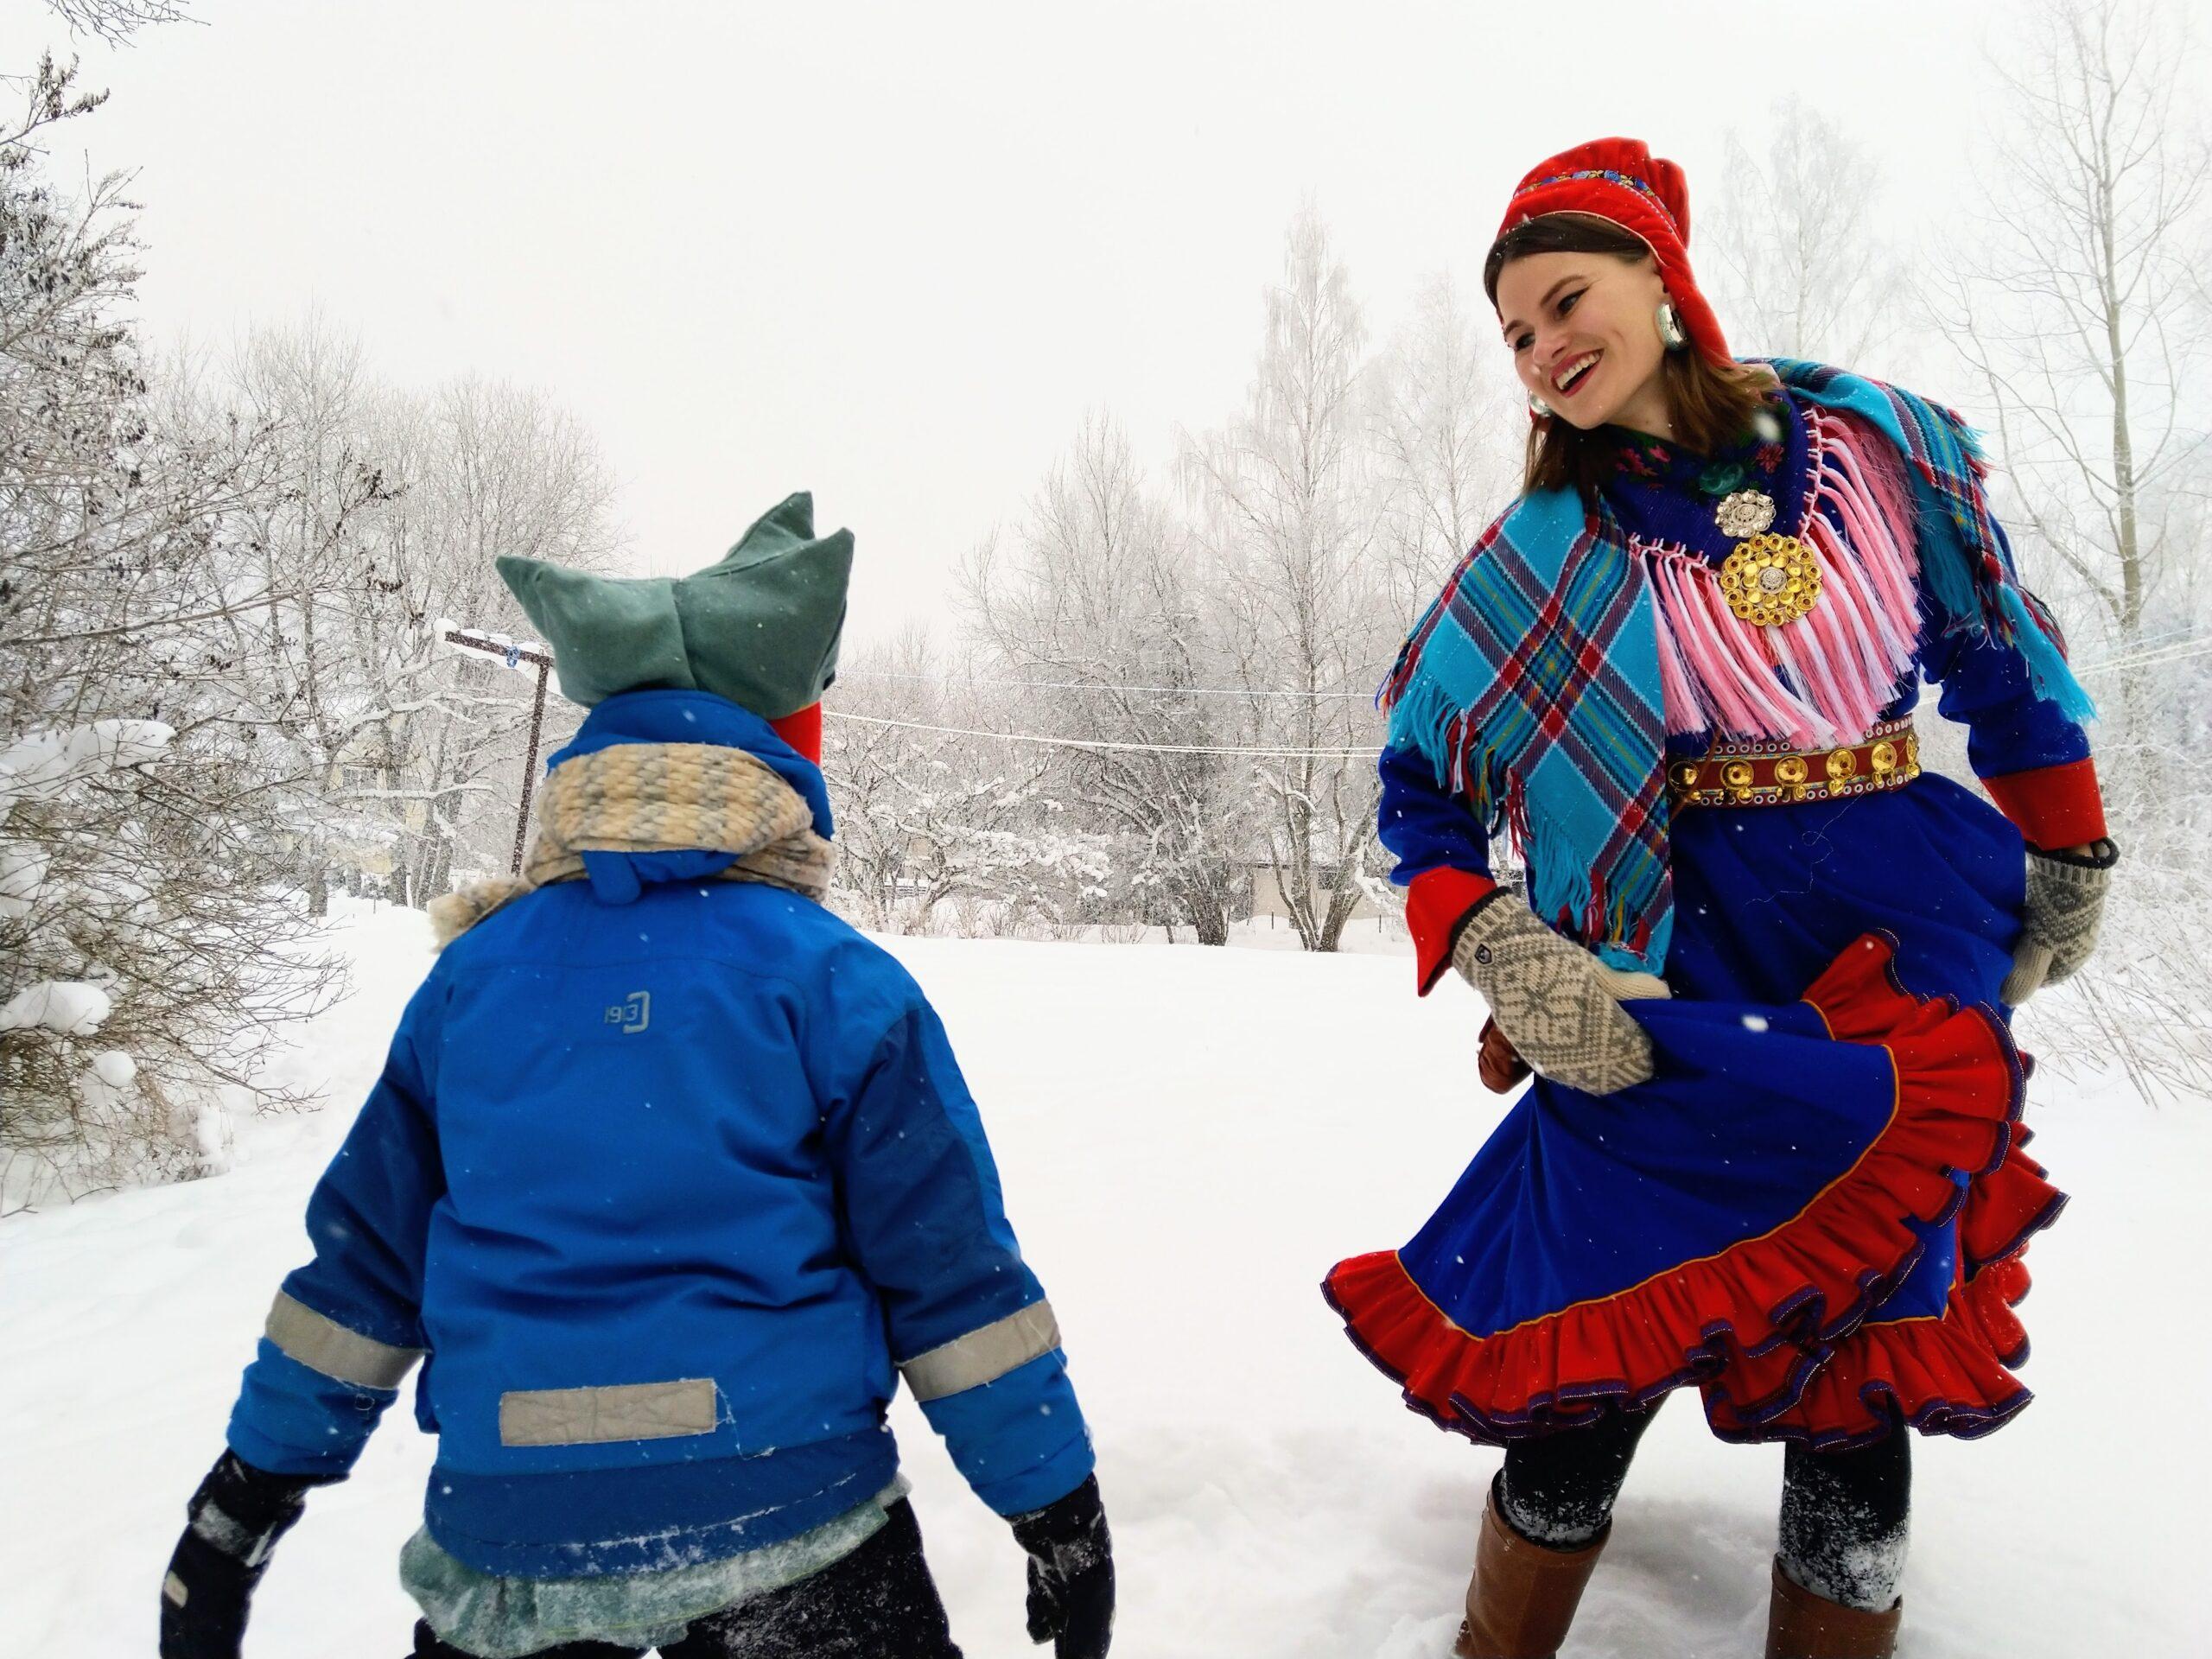 Image of Finnish Sámi speaker - Making Space for Europe's Endangered Languages